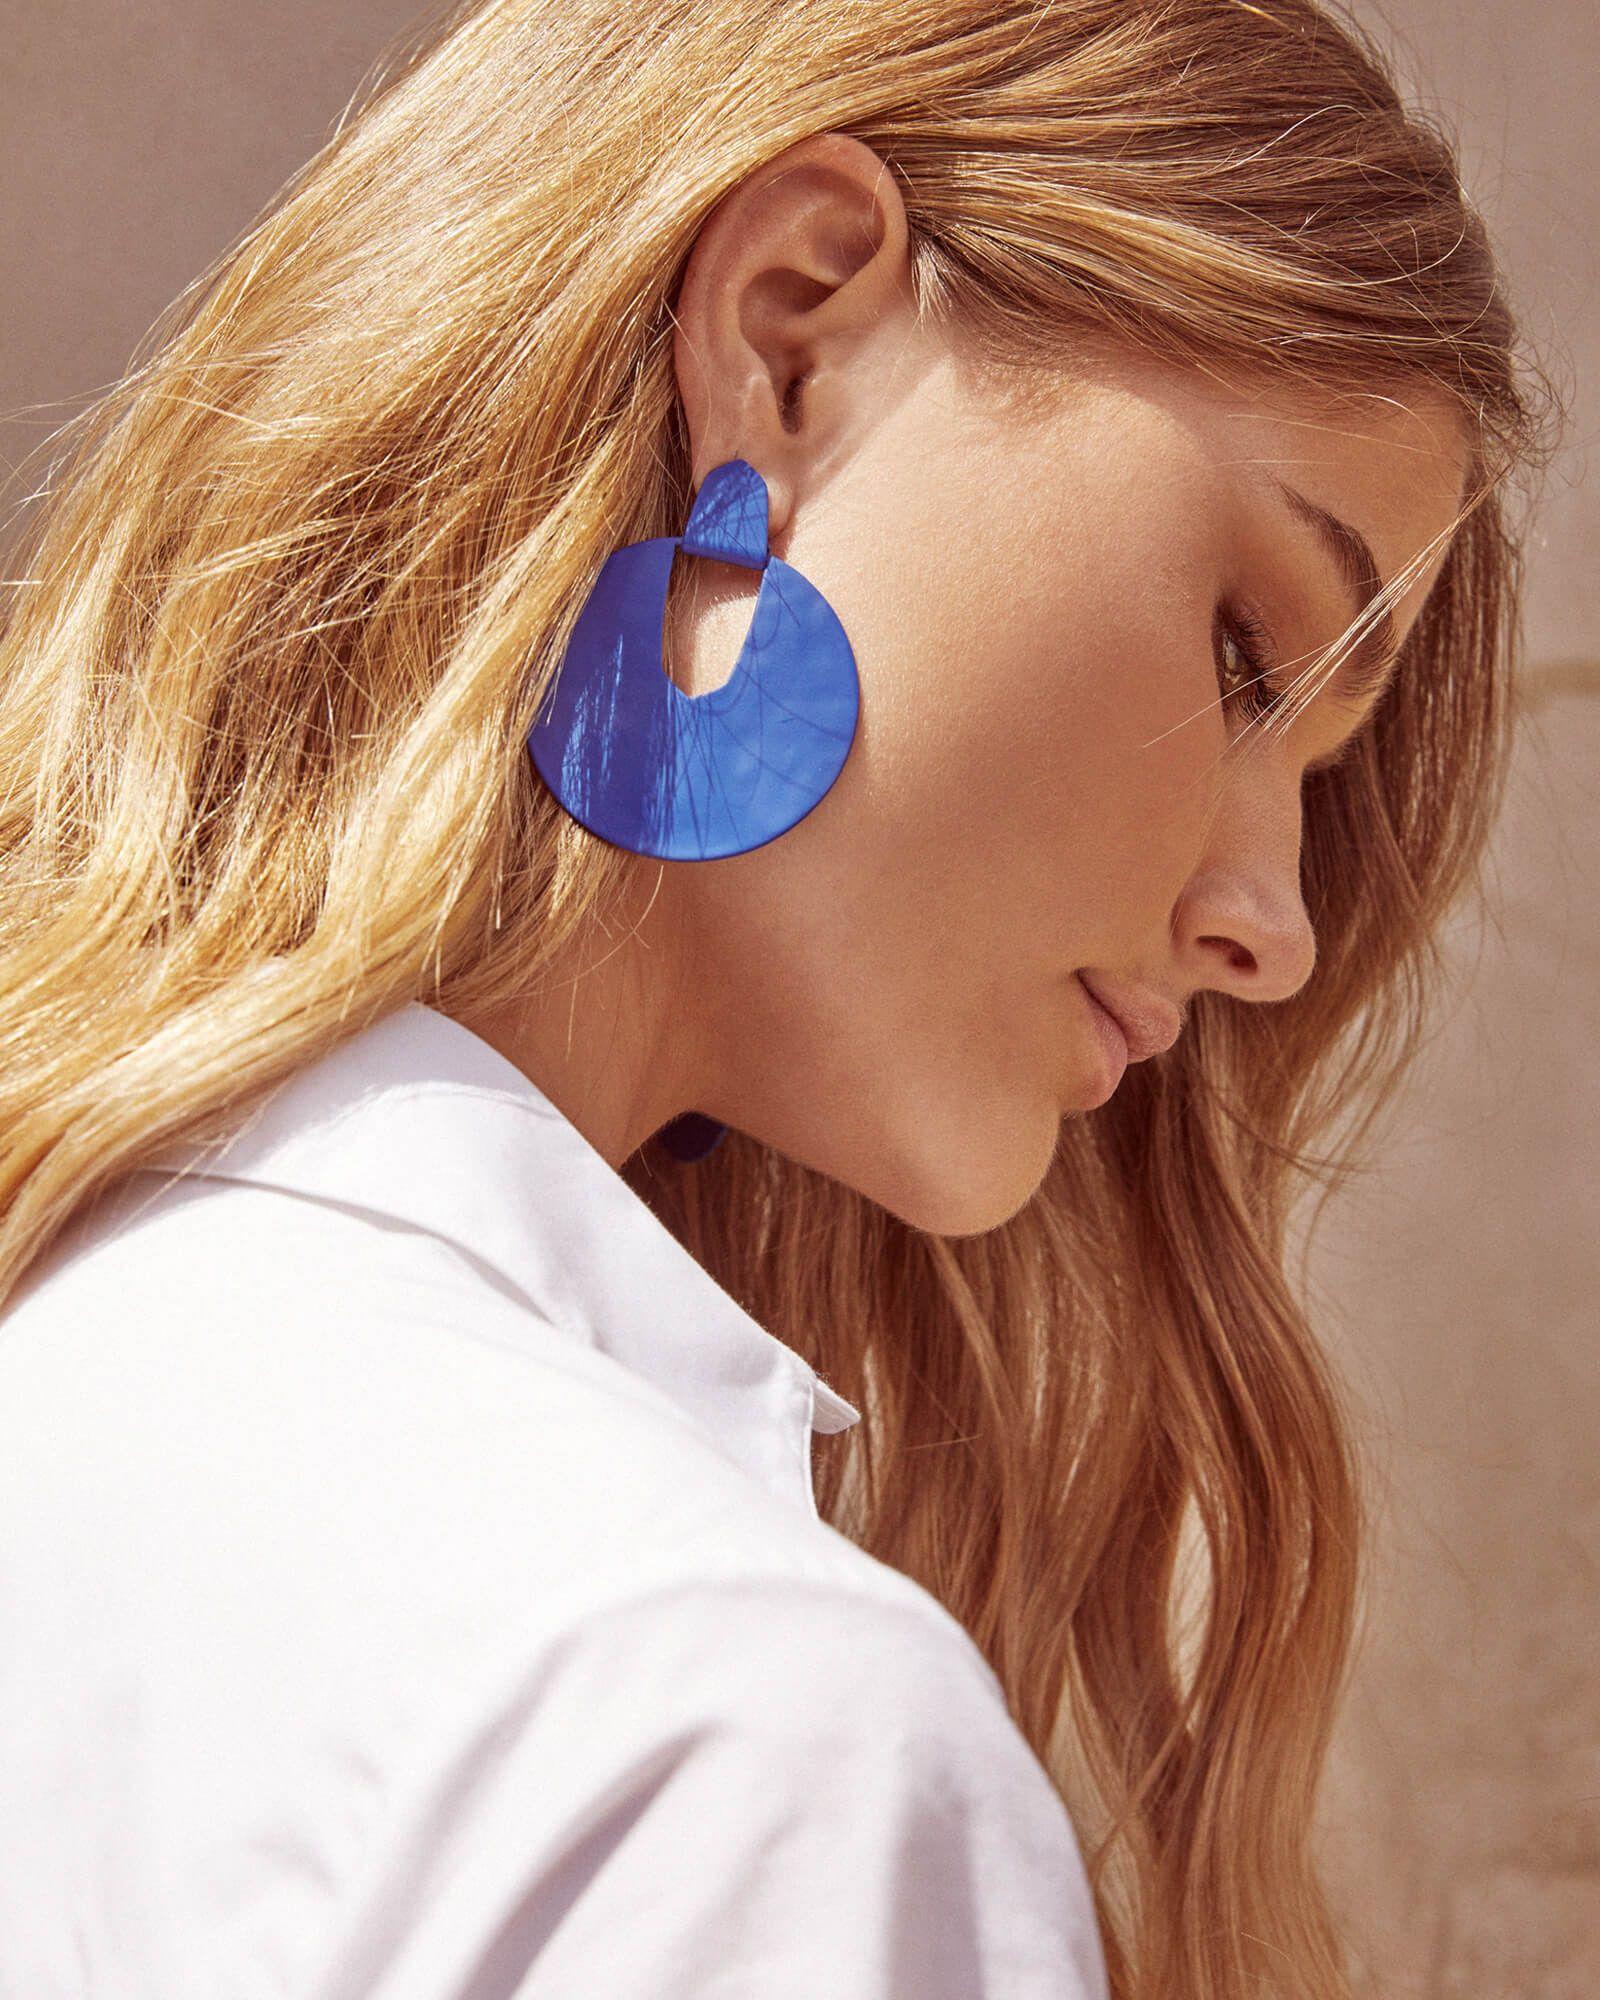 ca0a1d8f71798 New at Kendra Scott   Diane Matte Statement Earrings in Cobalt   New ...